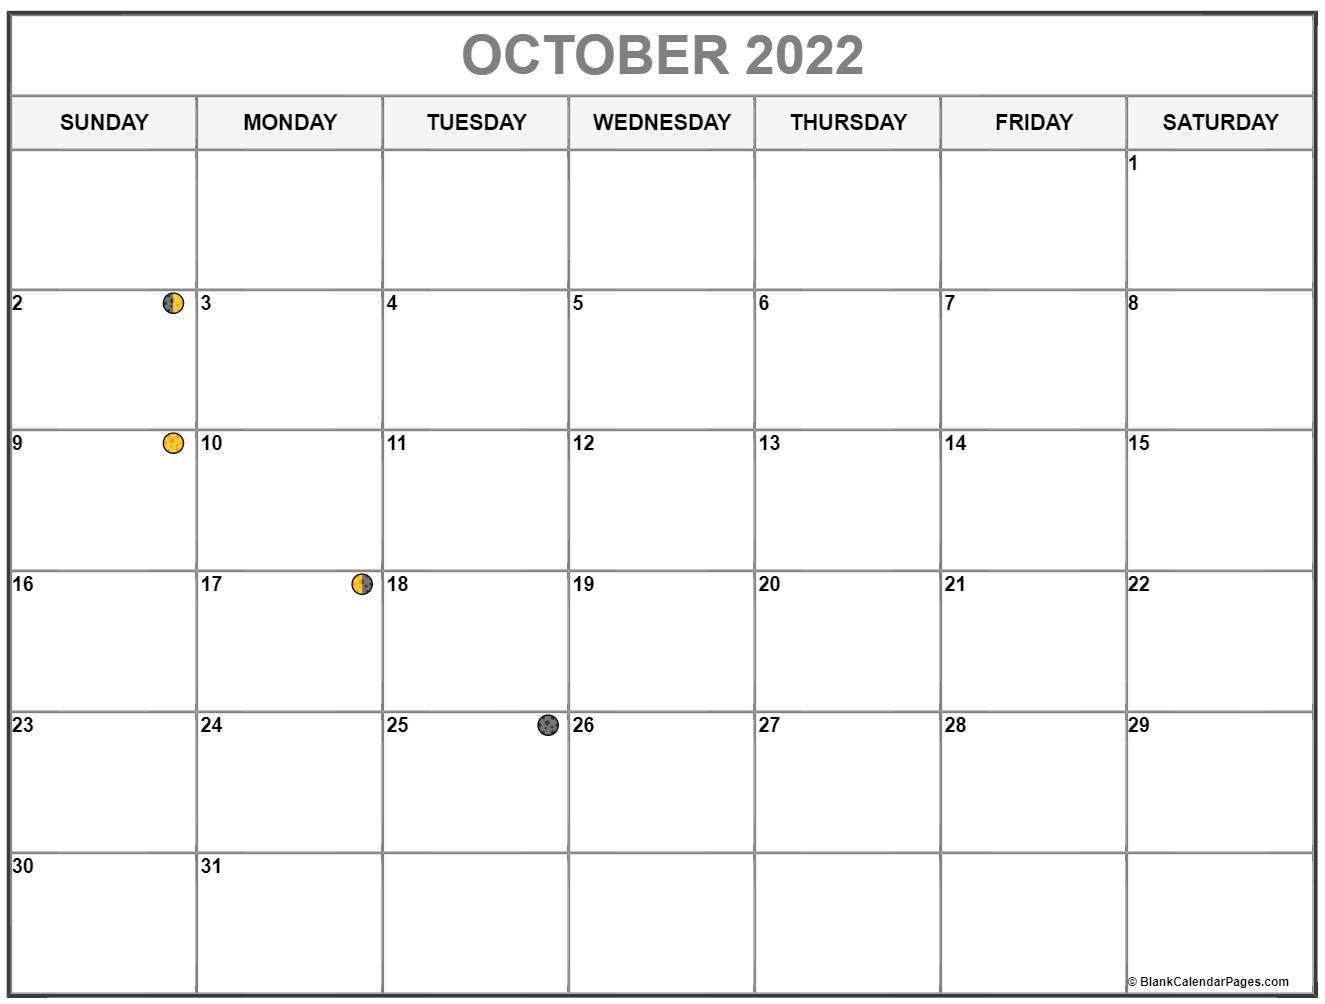 October 2018 Lunar calendar. moon phase calendar with USA holidays